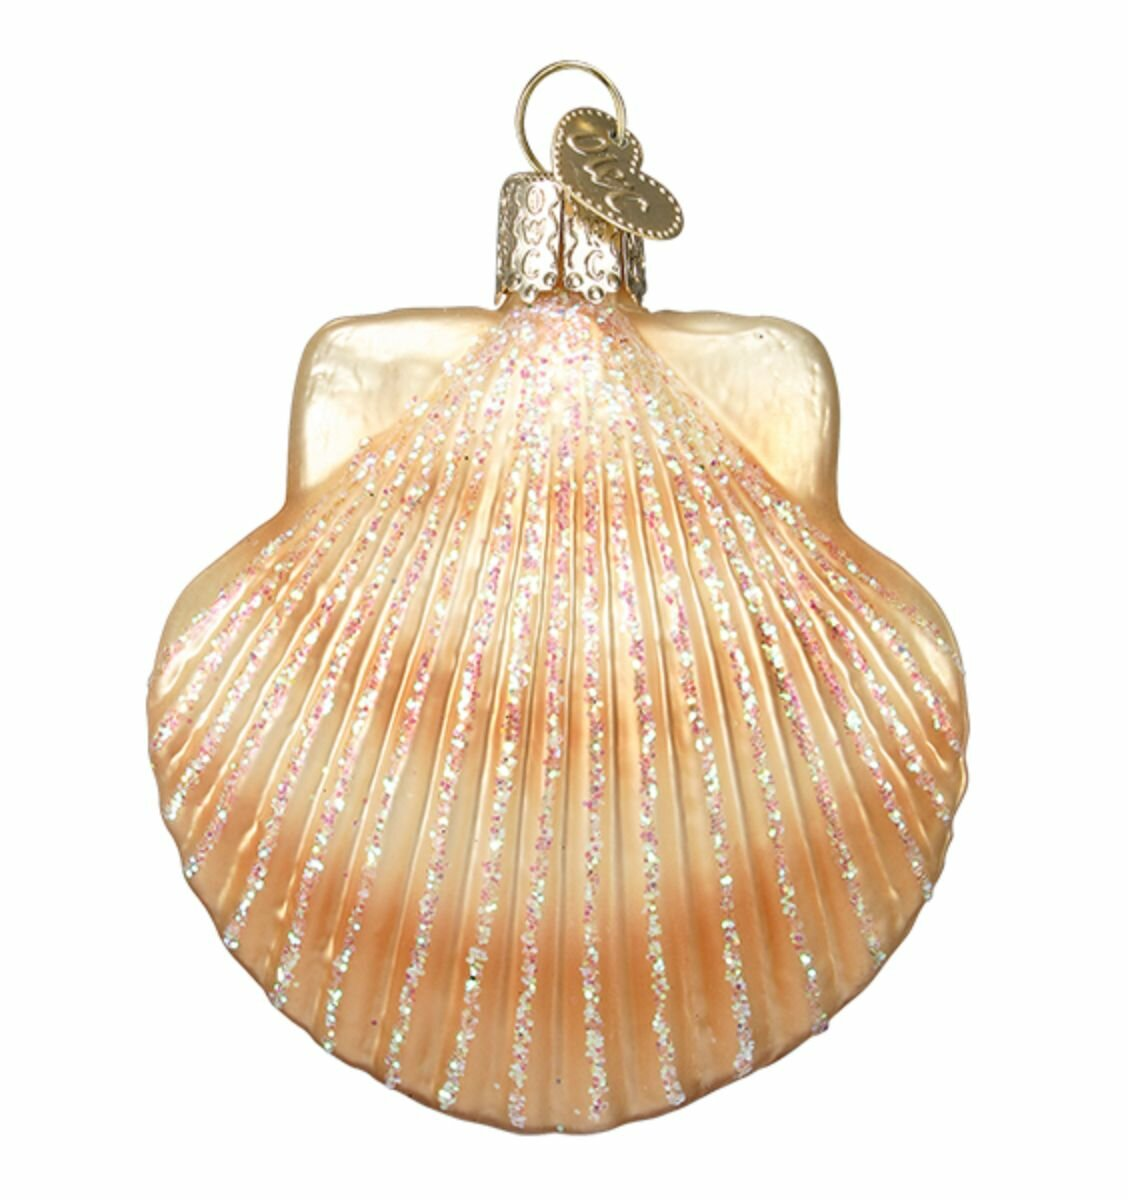 Old World Christmas Scallop Shell Hanging Figurine Ornament Wayfair